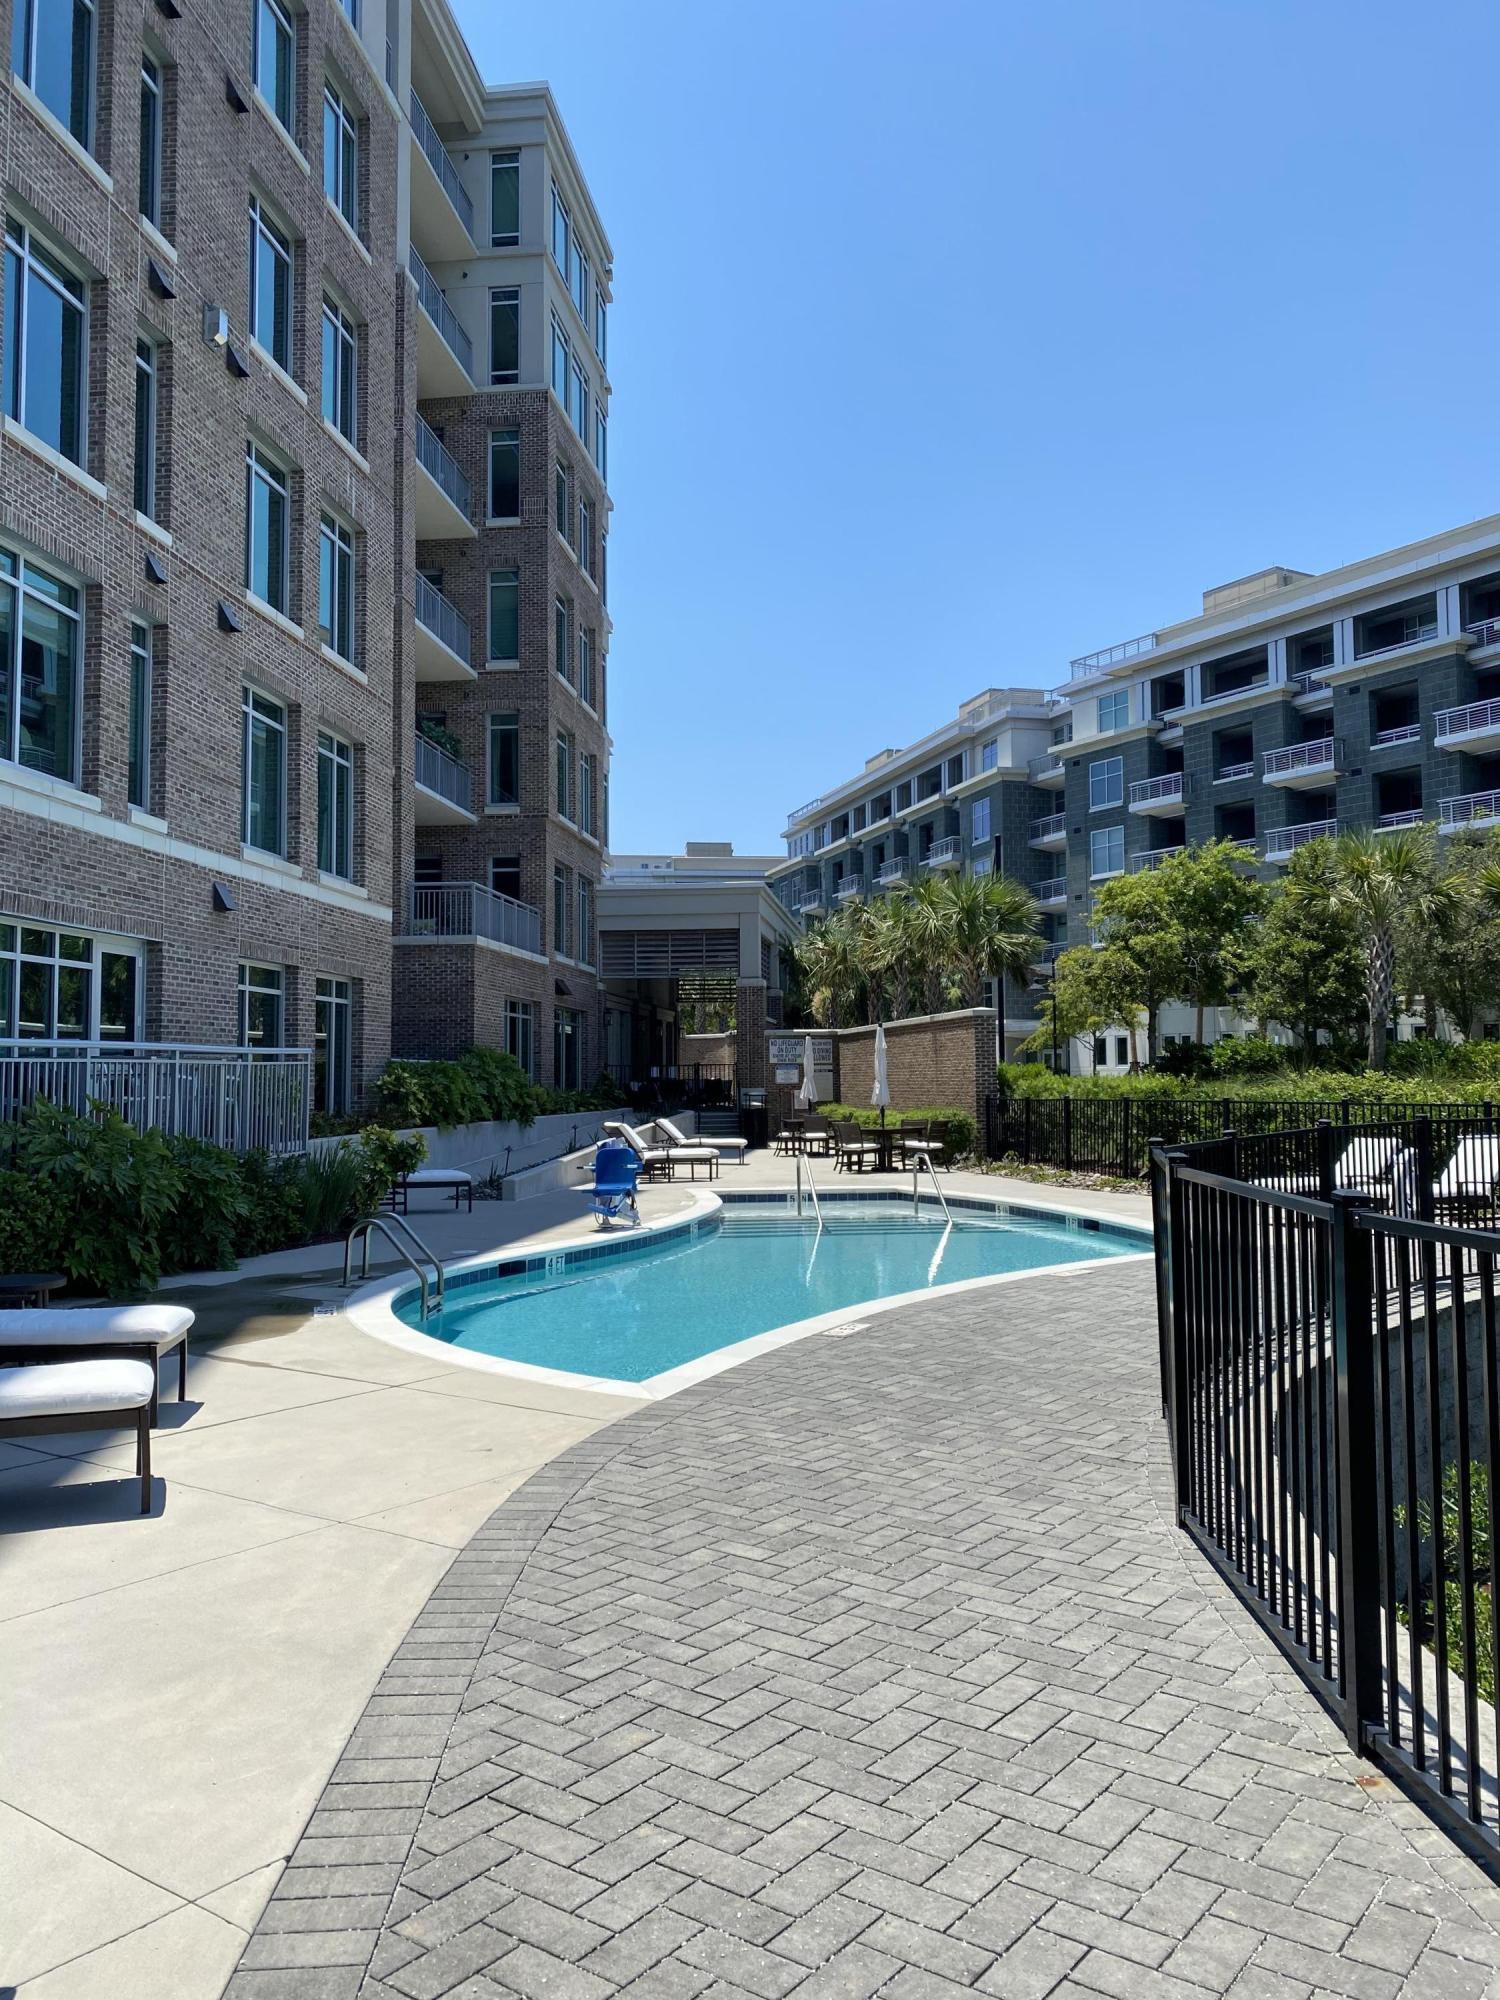 Tides Condominiums Homes For Sale - 155 Wingo, Mount Pleasant, SC - 0